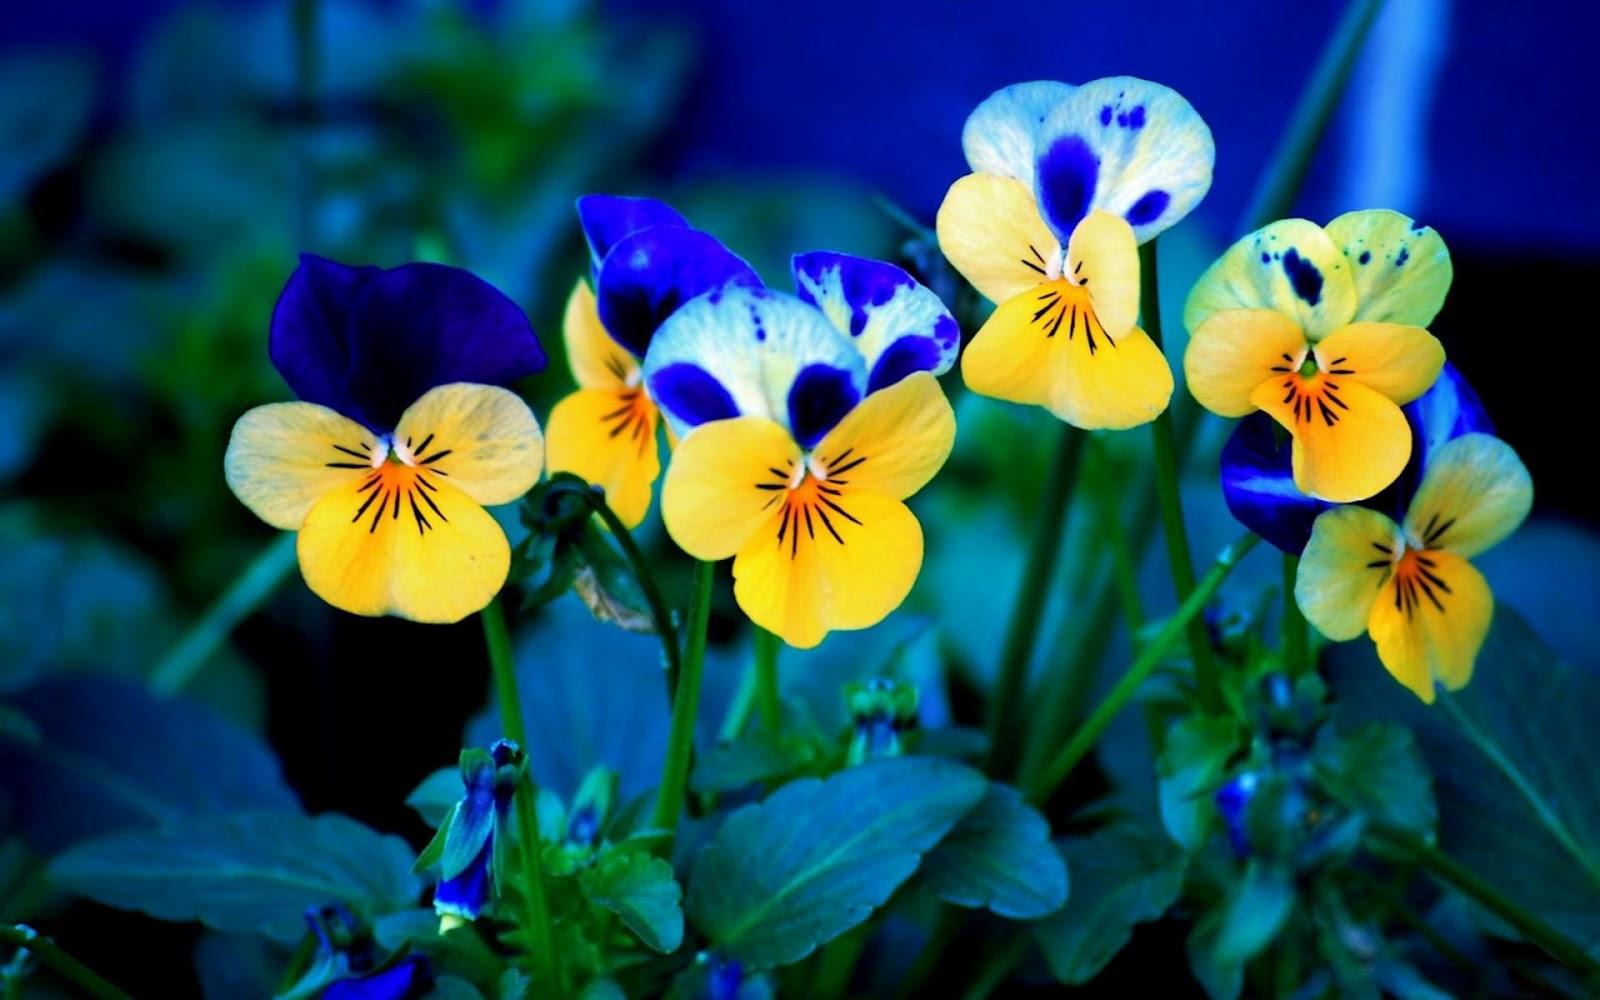 beautiful flowers nature hd download for pc desktop wallpaper 1600x1000